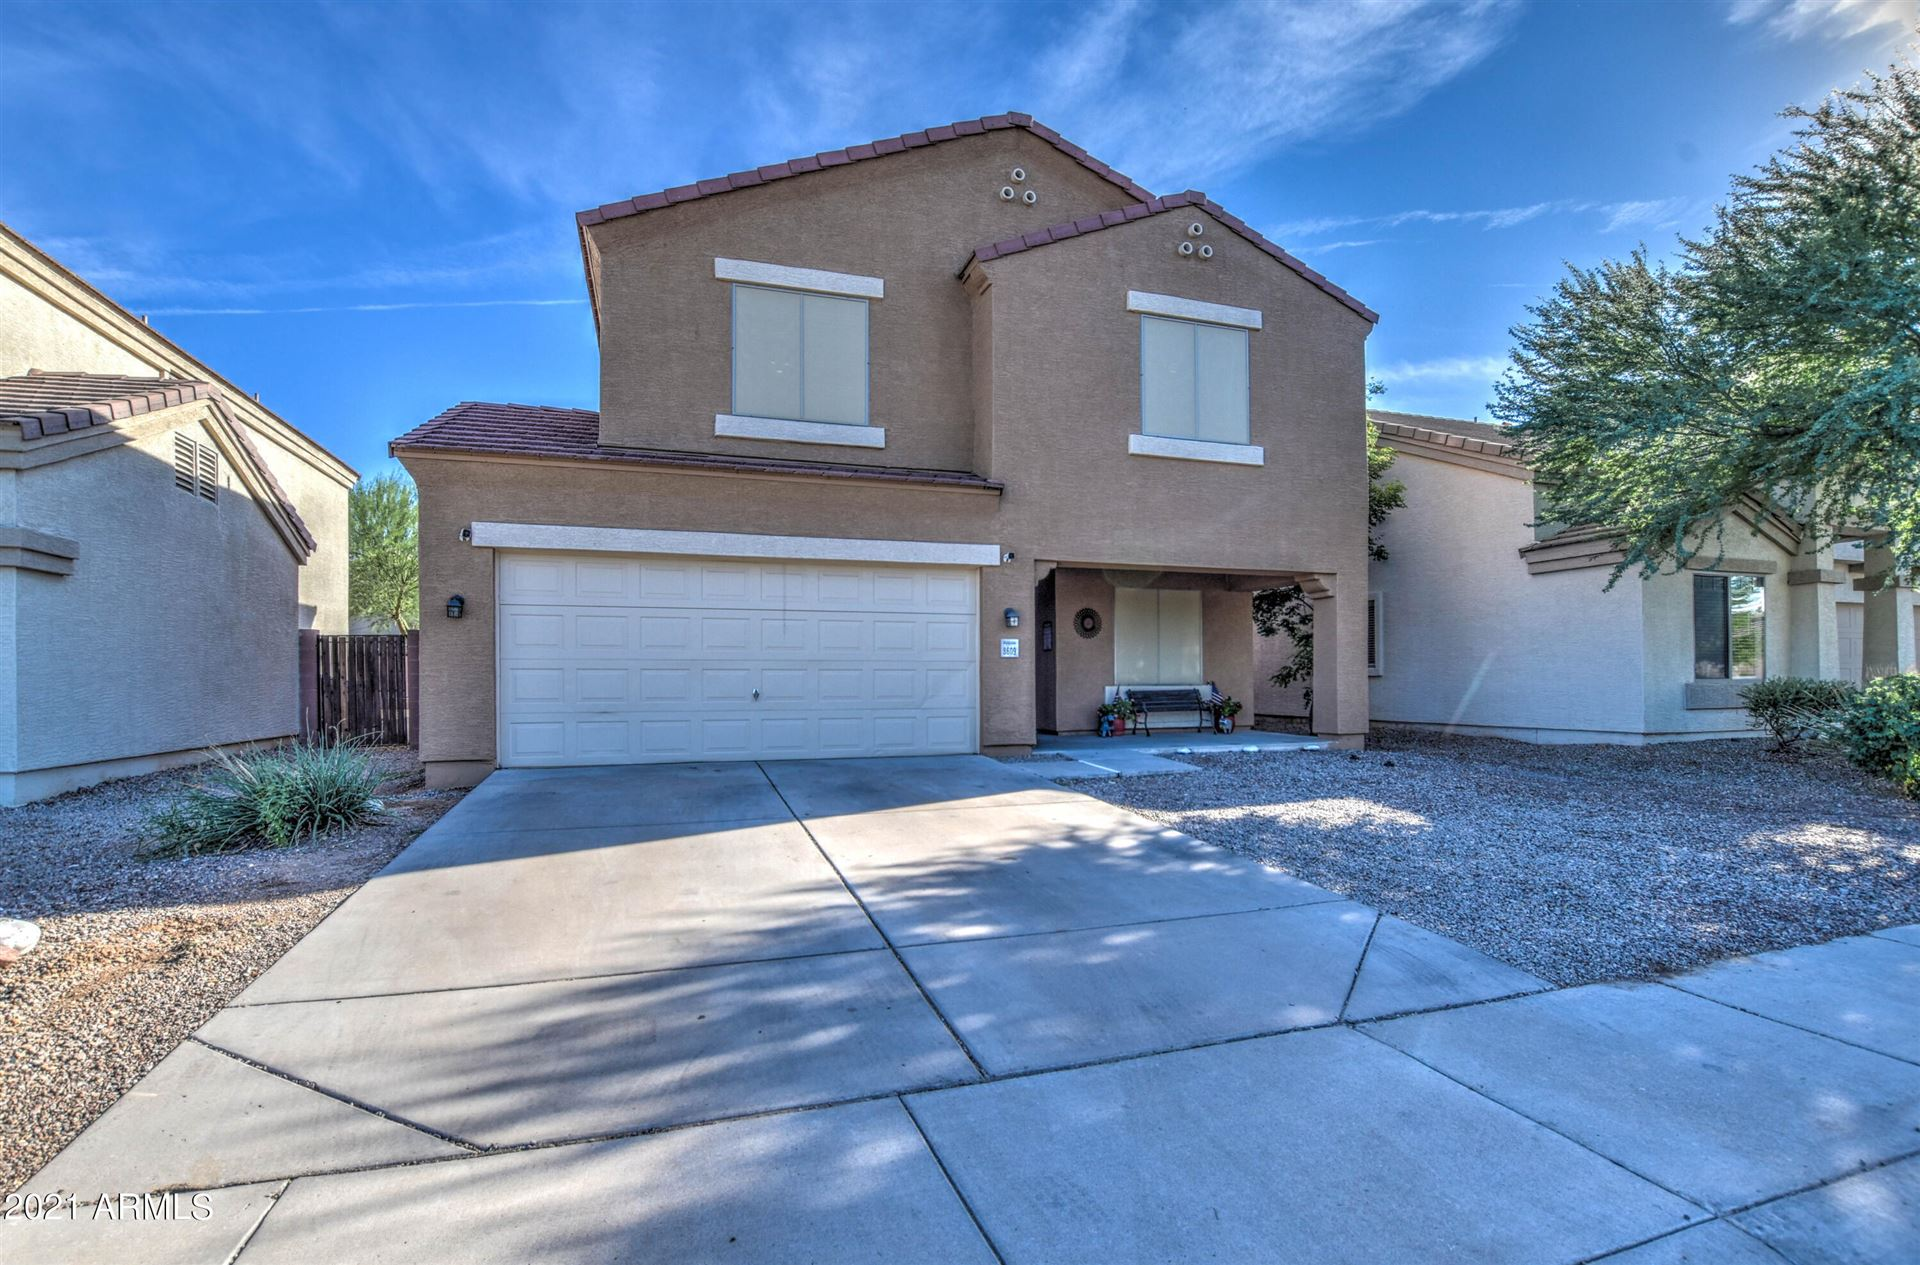 Photo of 8609 W CORDES Road, Tolleson, AZ 85353 (MLS # 6306008)